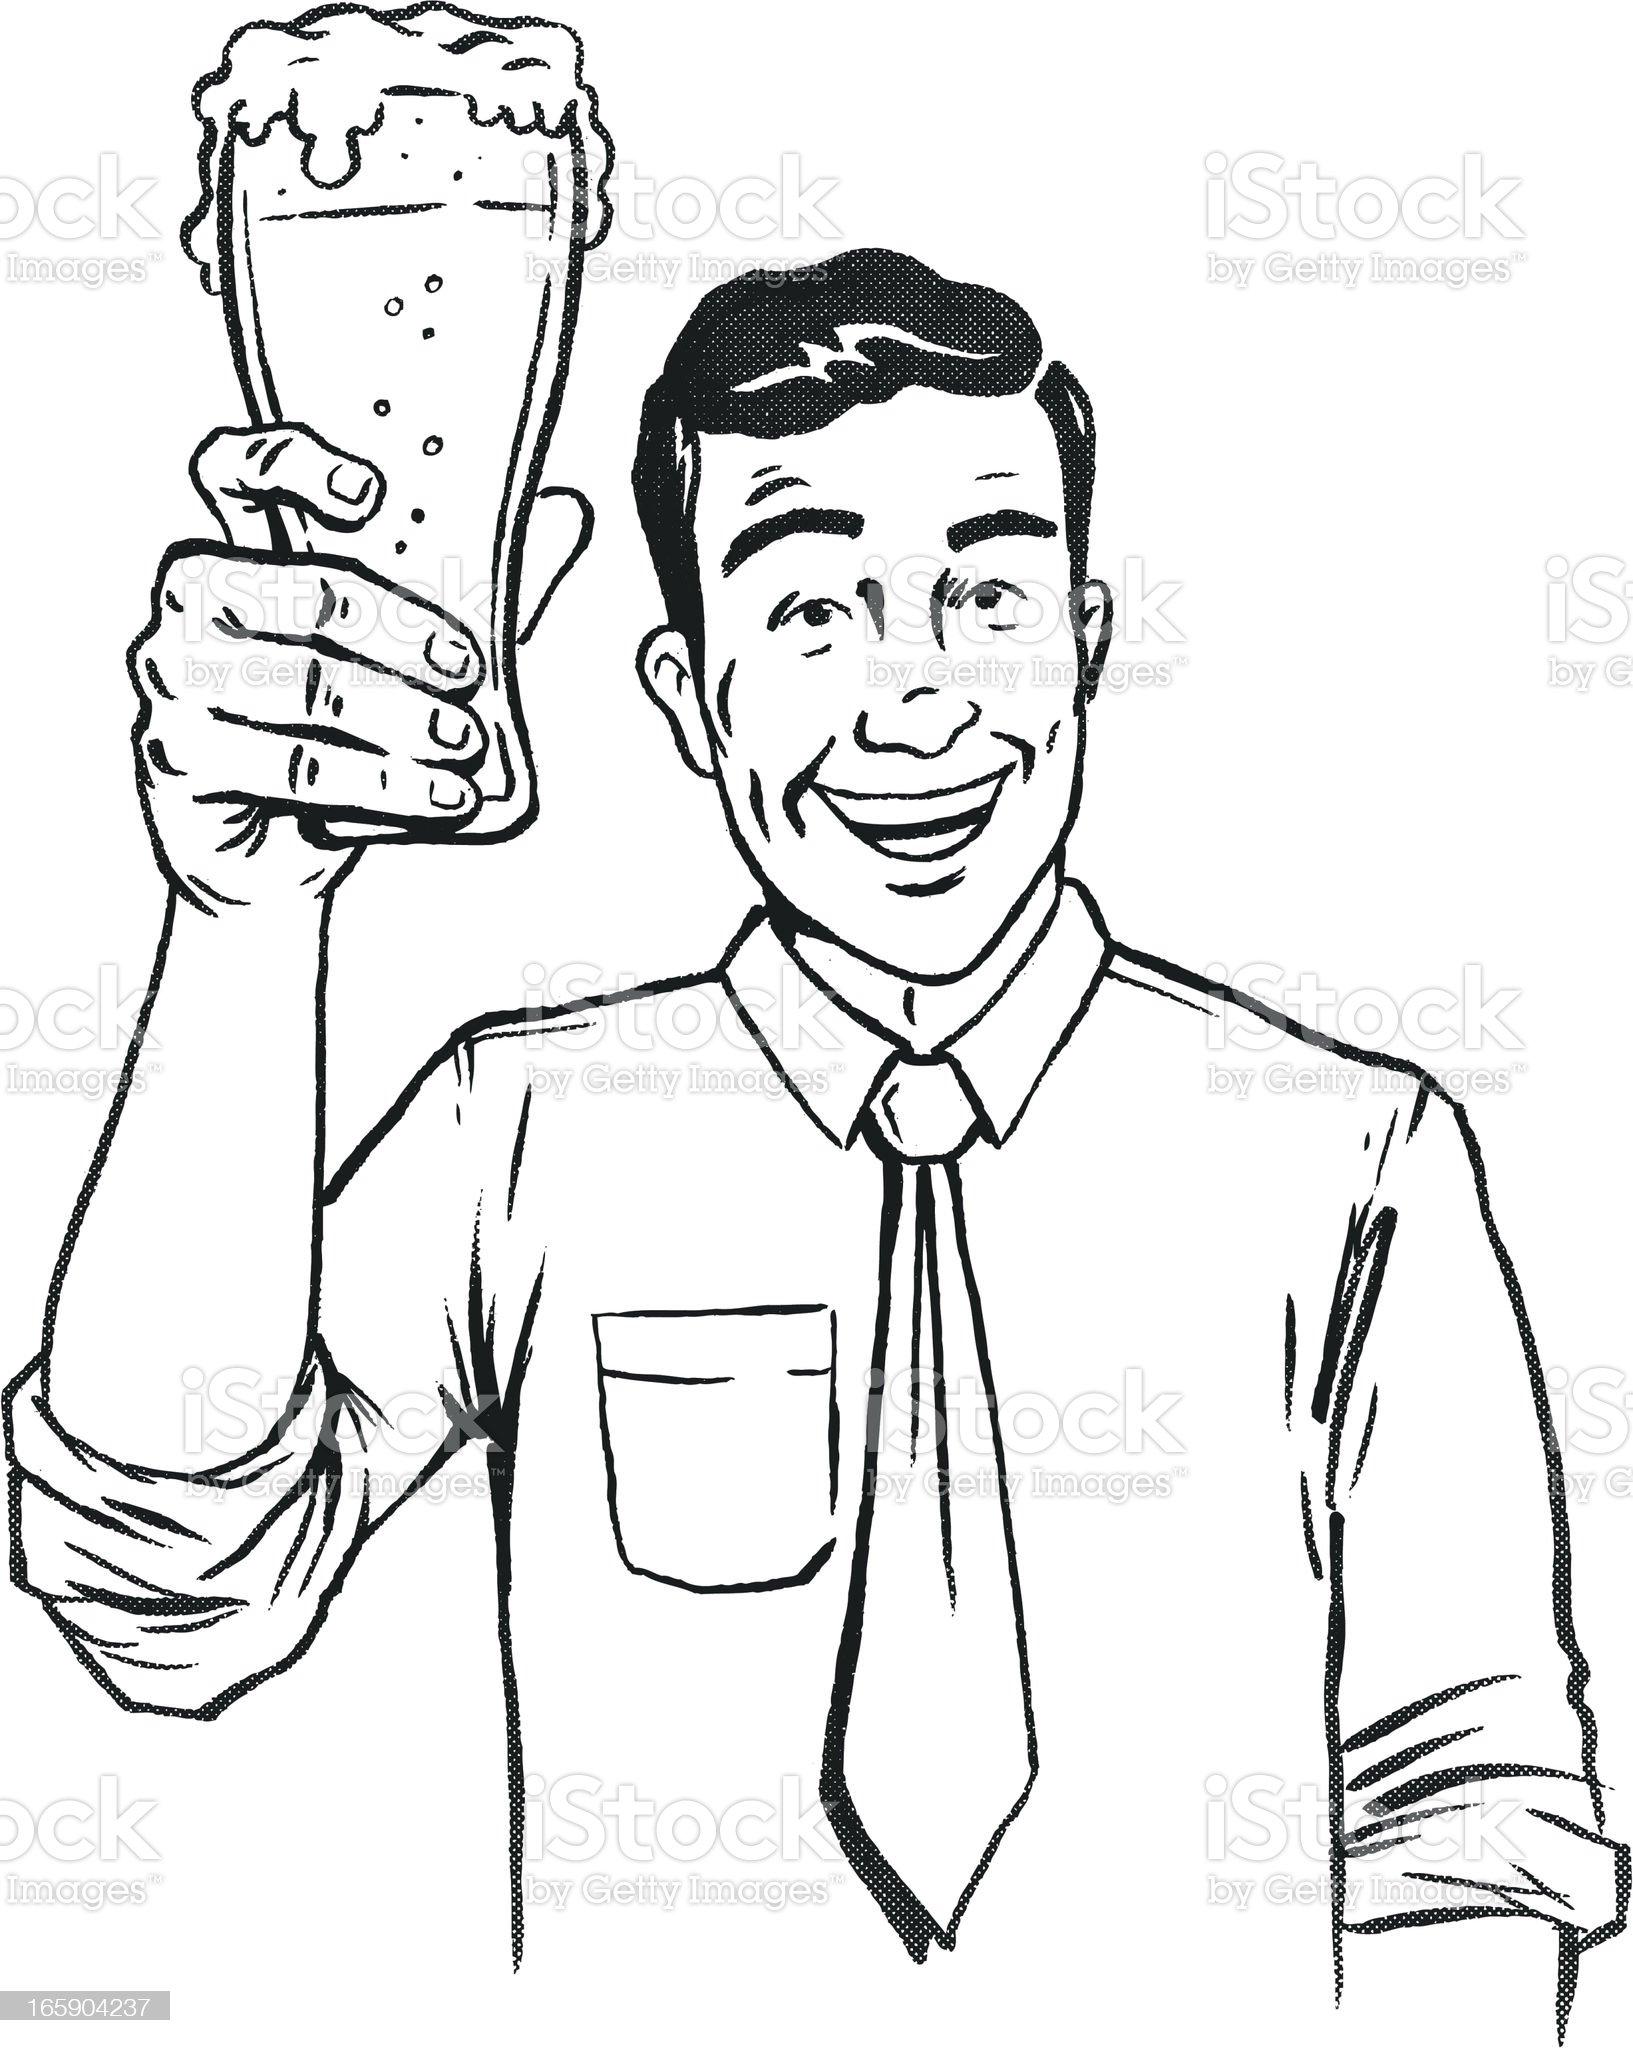 Retro Beer Toast royalty-free stock vector art